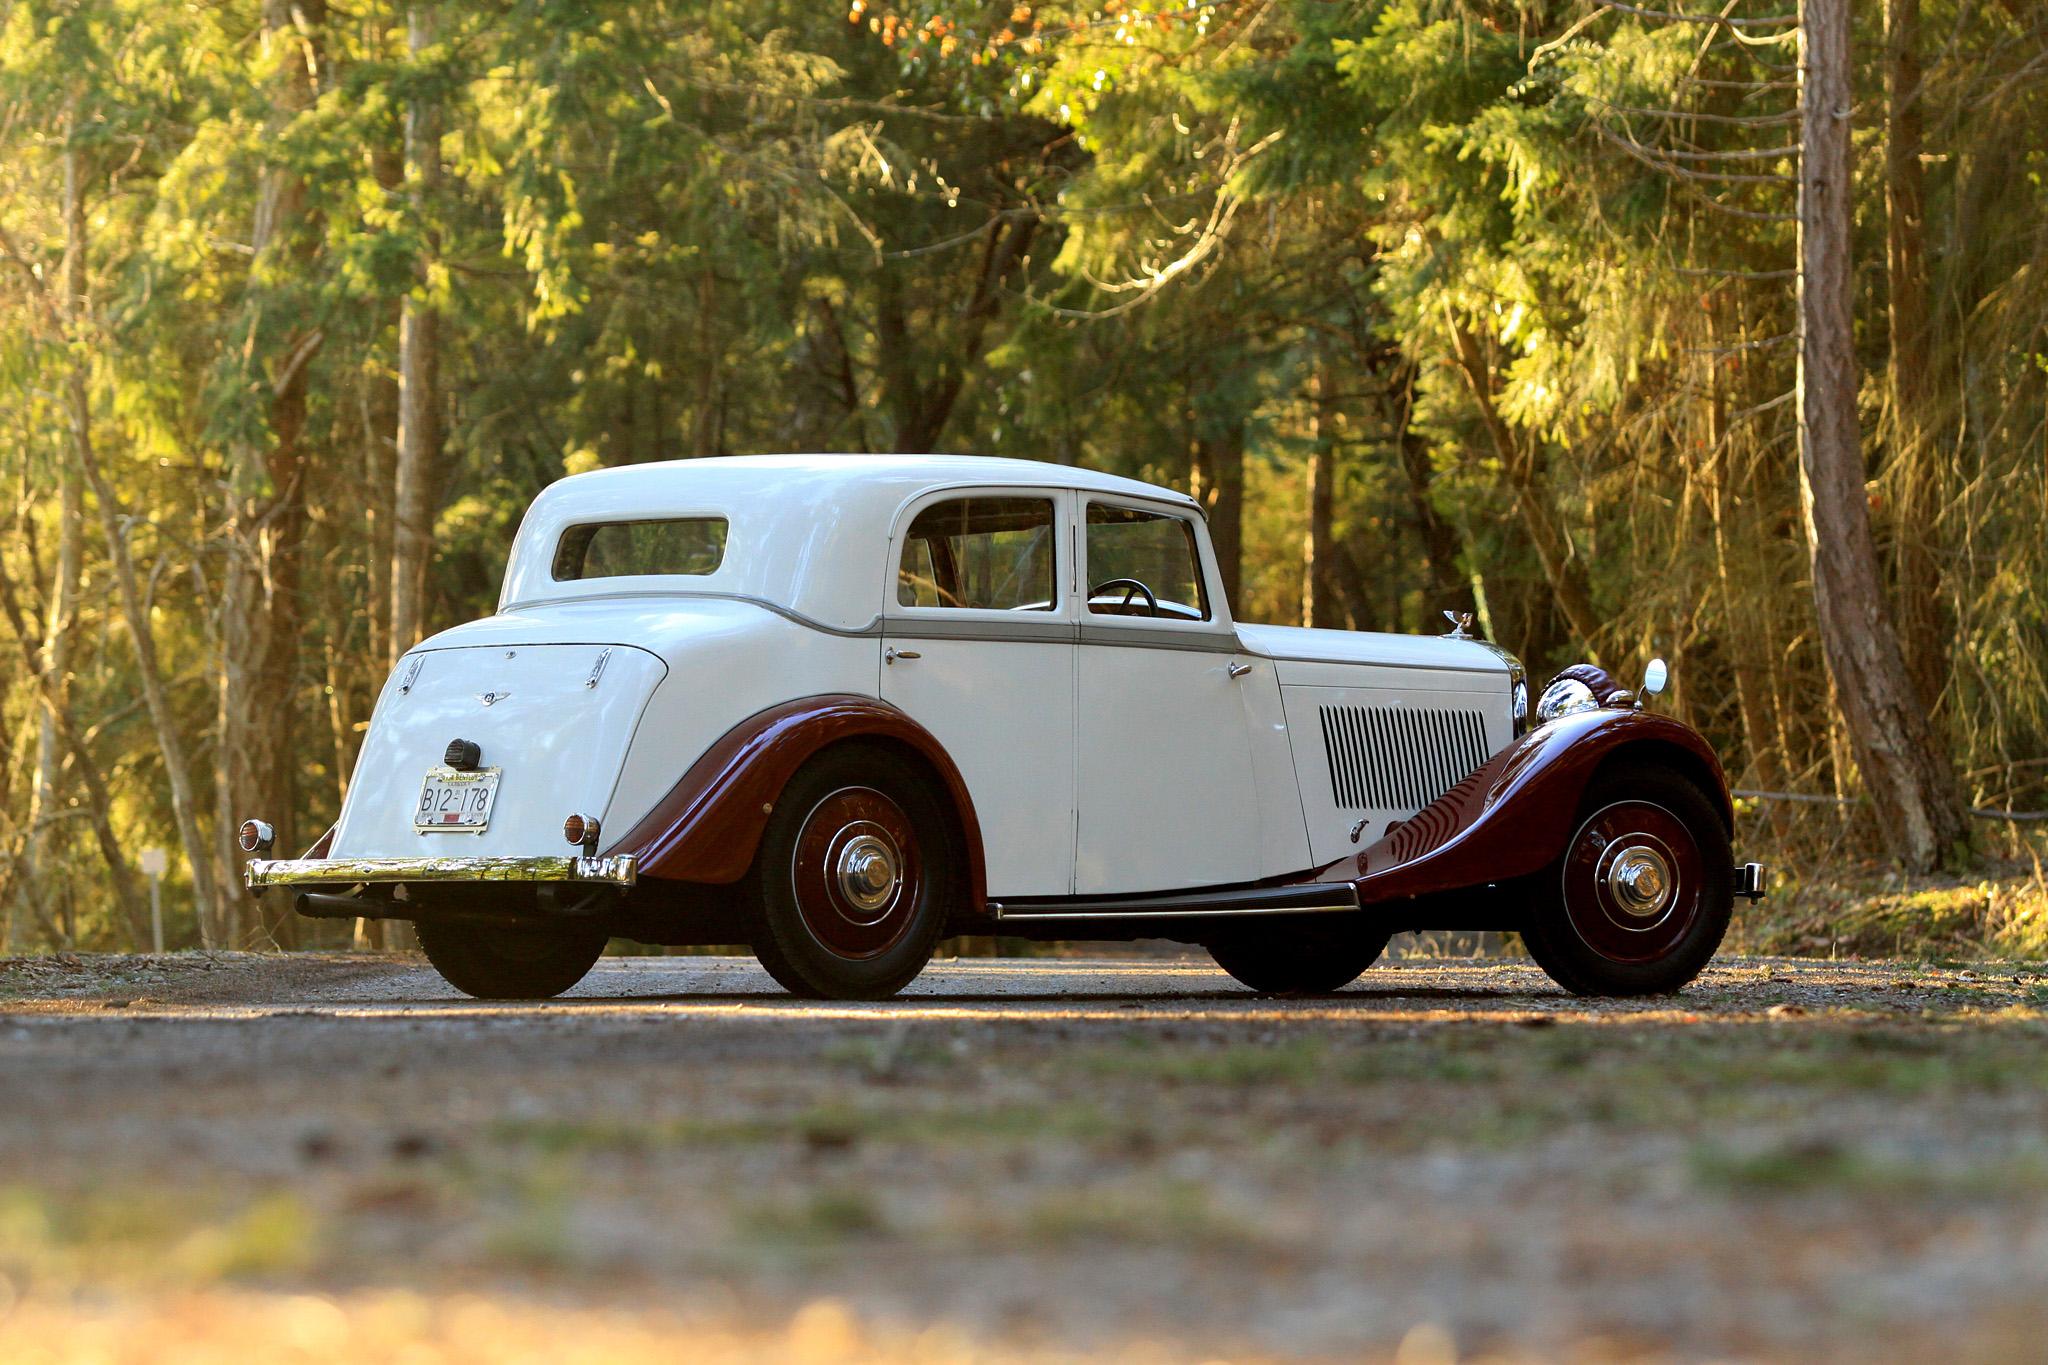 ghana elegance sale high needed cars old bentley rising end in weddings vintage urgent for vin